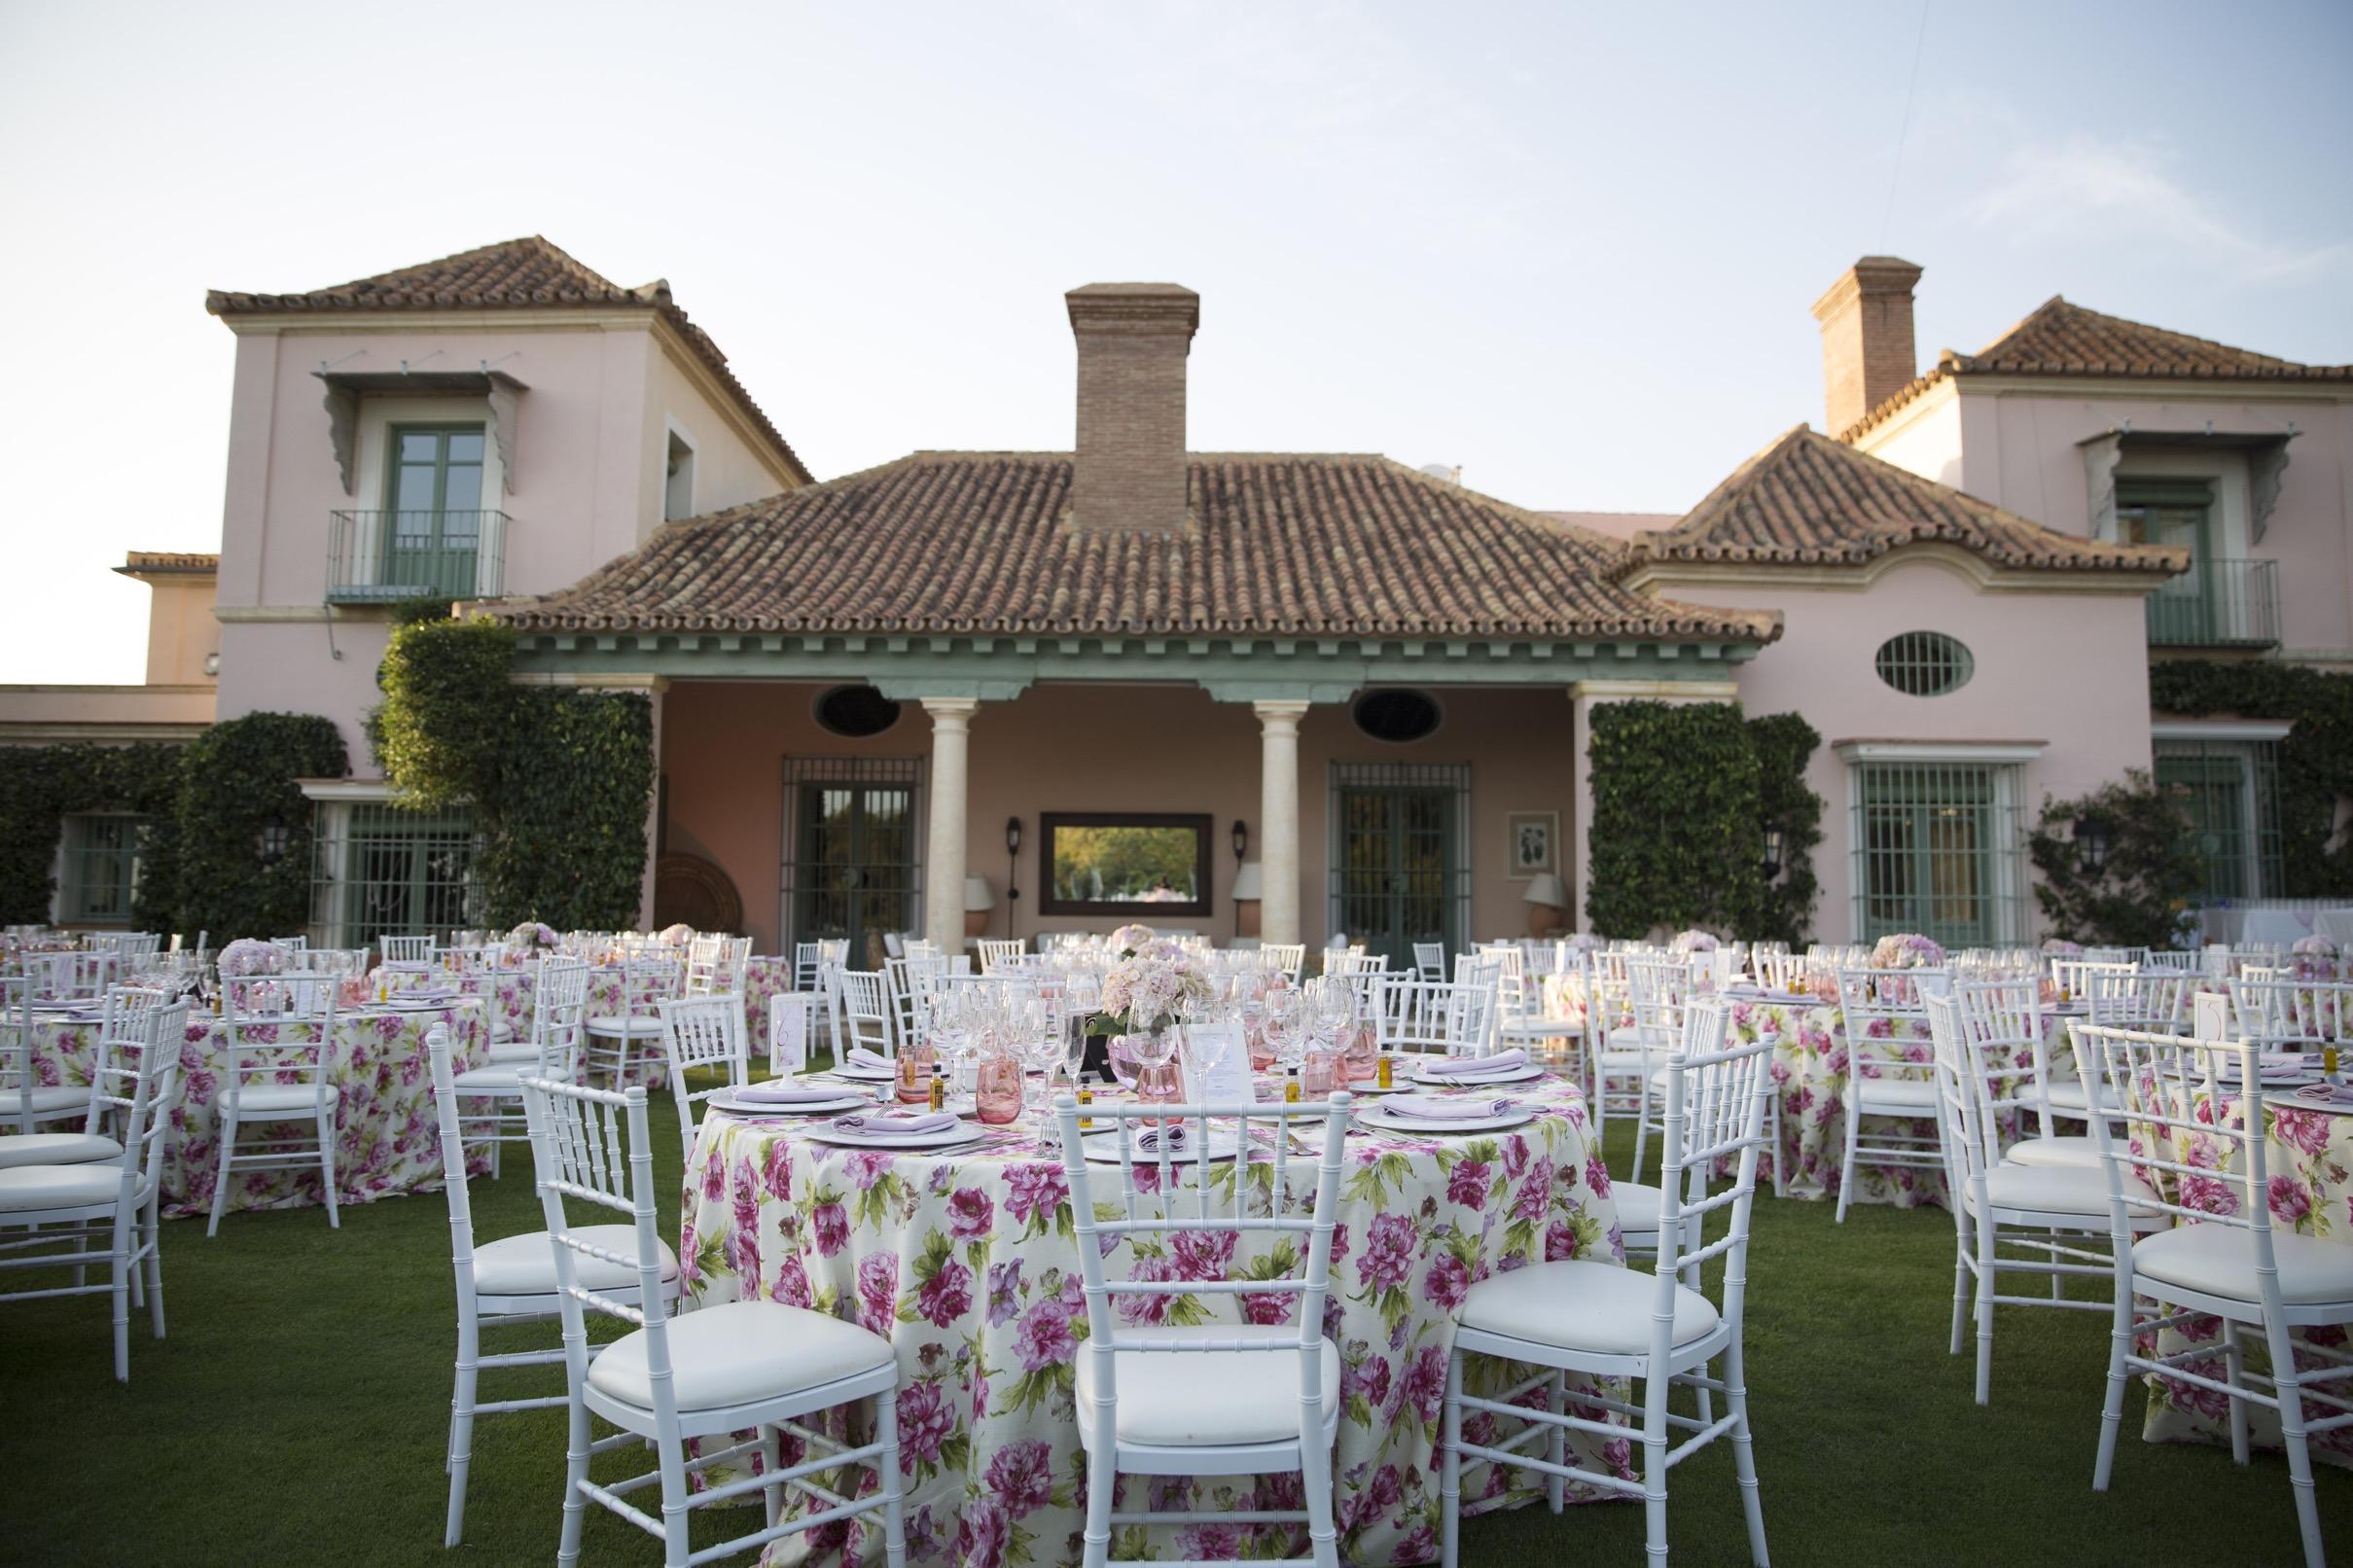 Si-Quiero-Wedding-Planner-By-Sira-Antequera-Sonia-Carlos-9